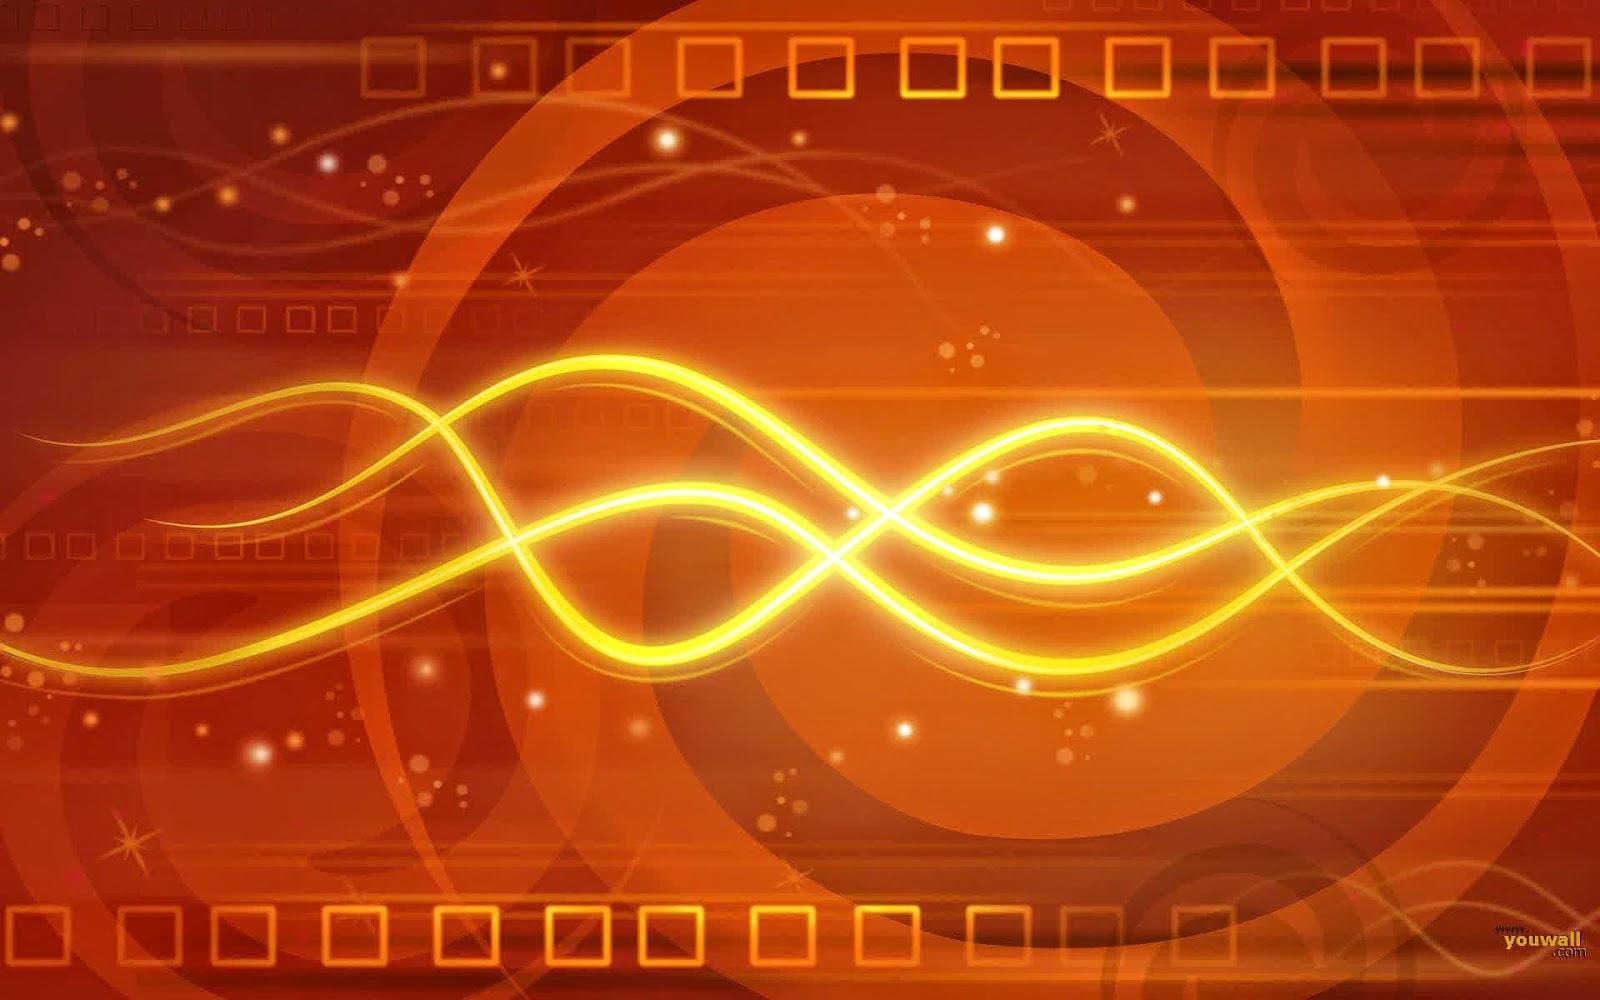 Download Wallpaper Hd Untuk Pc Download Orange Wallpaper For Pc Gratis Elhasany Software